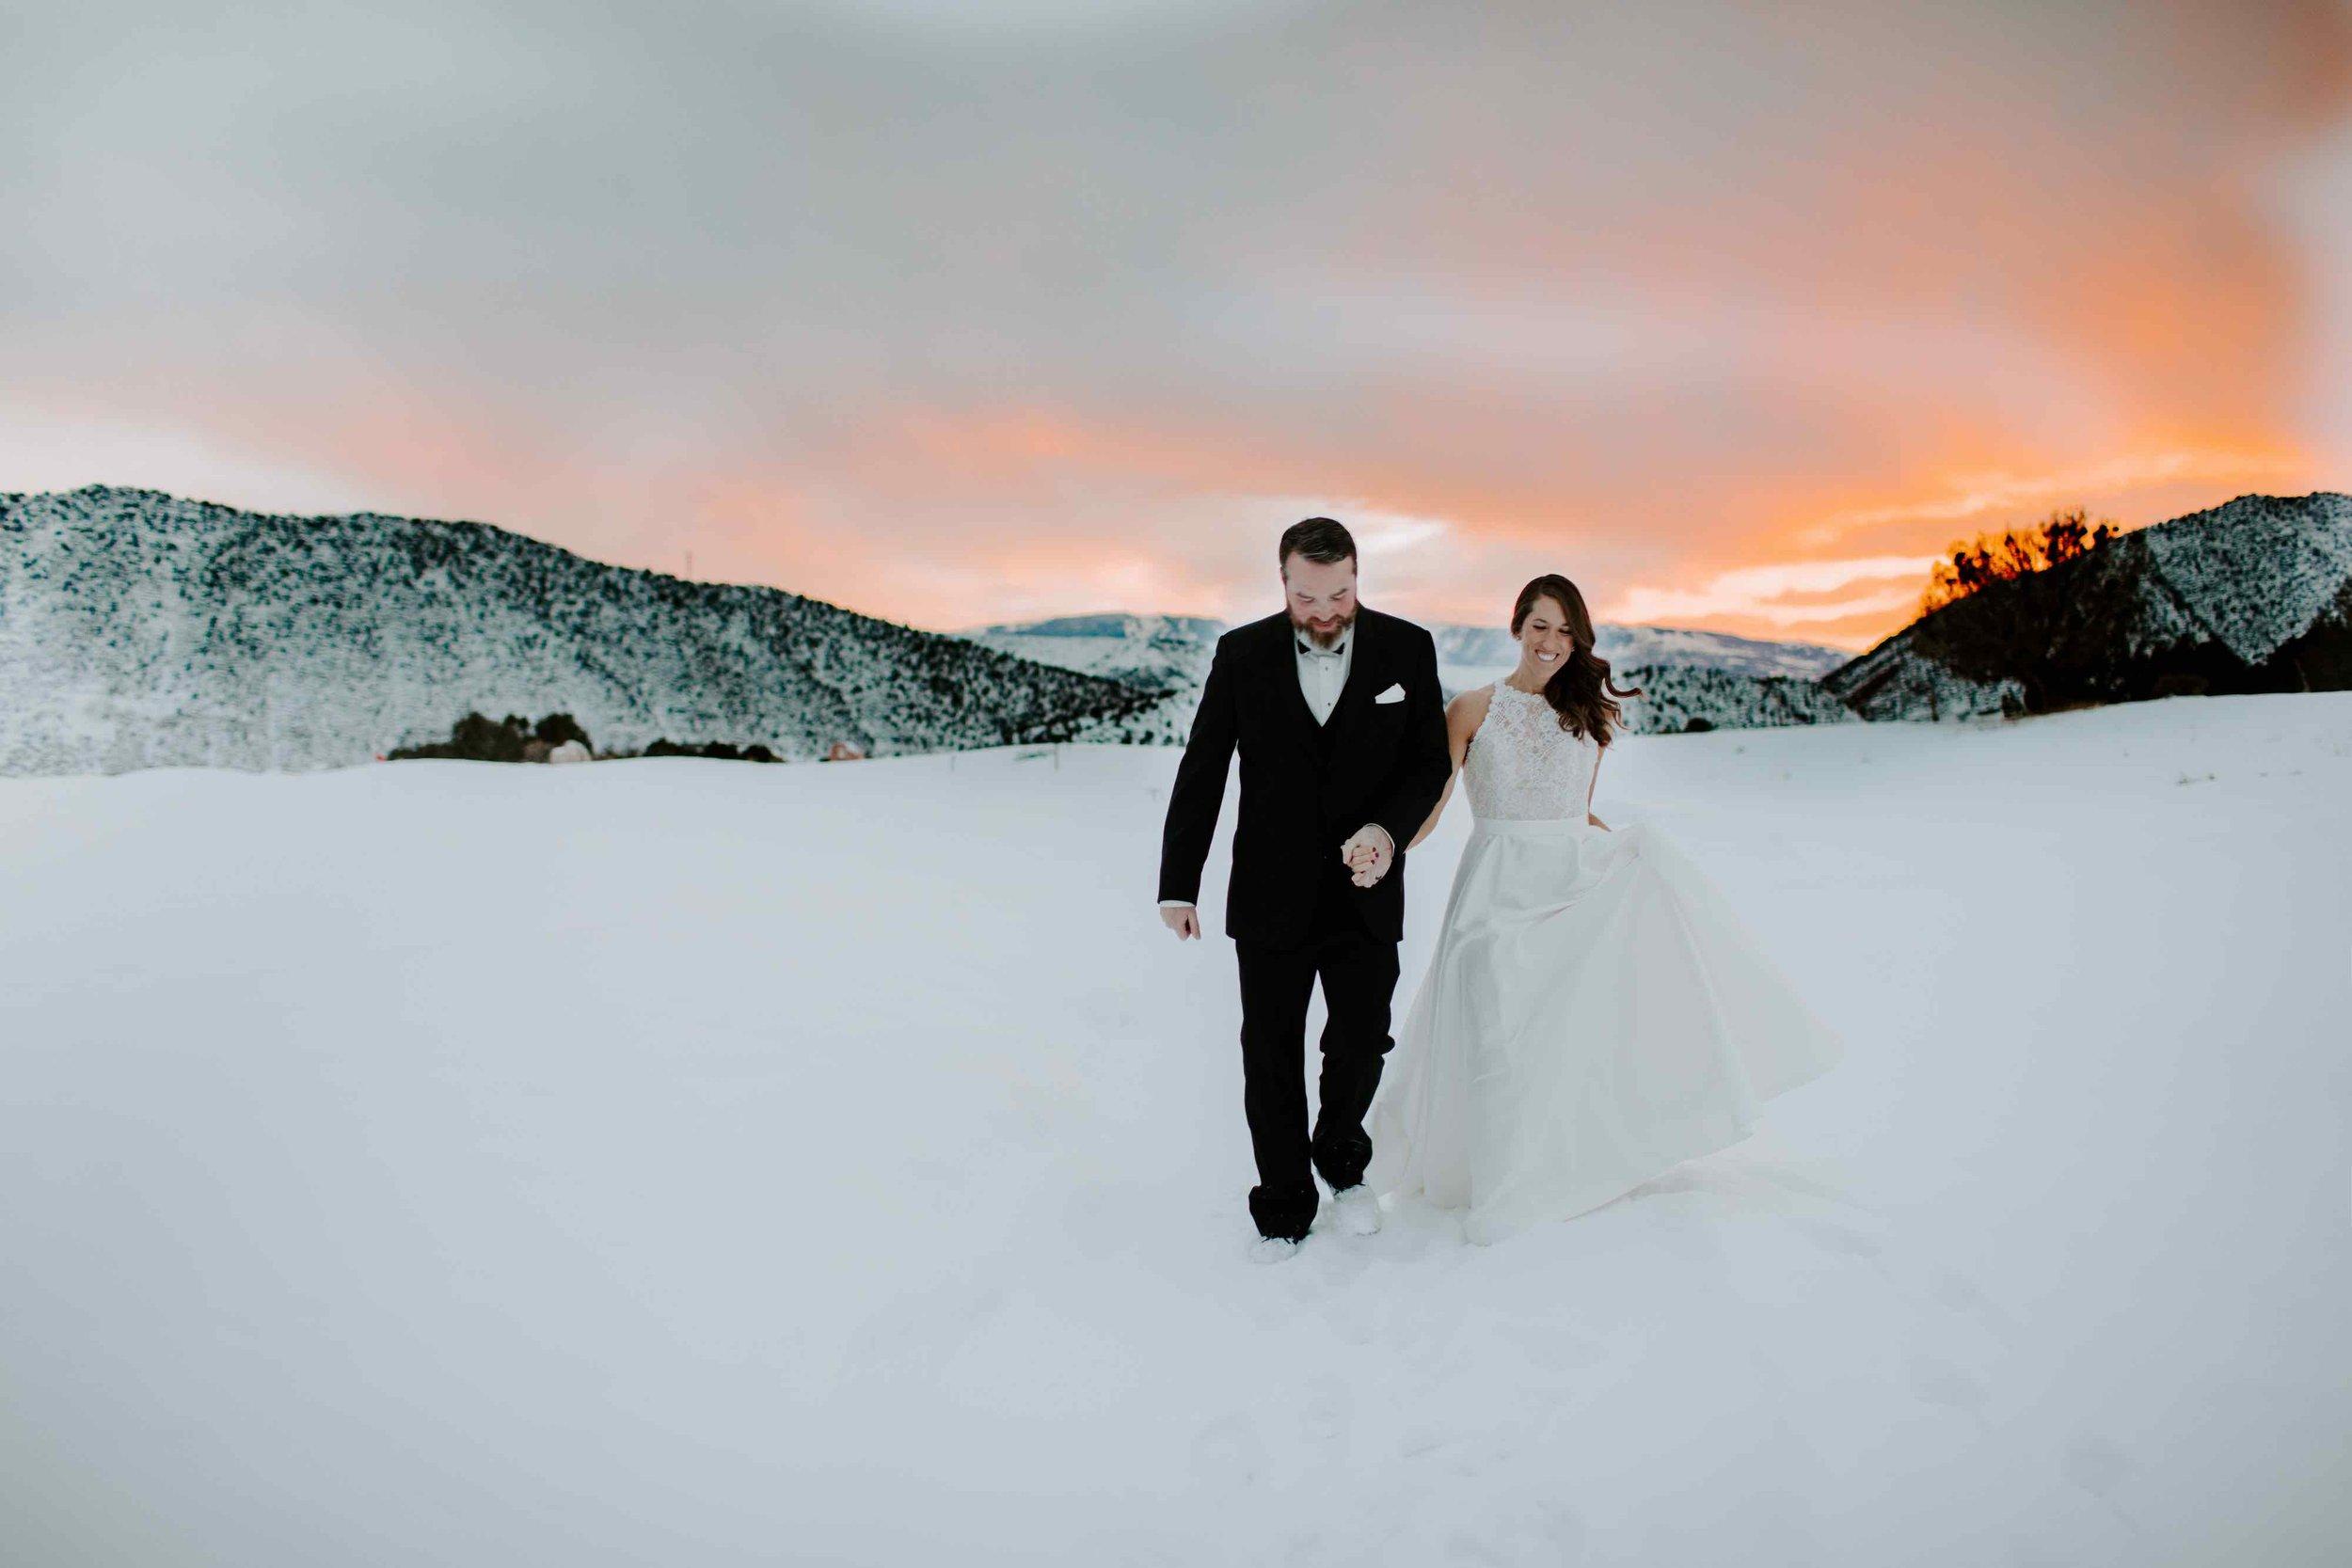 Kisa Conrad Favorites-0046-colorado-wedding-photographer-denver-springs-vailhotel-glenwood-springs-colorado-wedding-photographer.jpeg